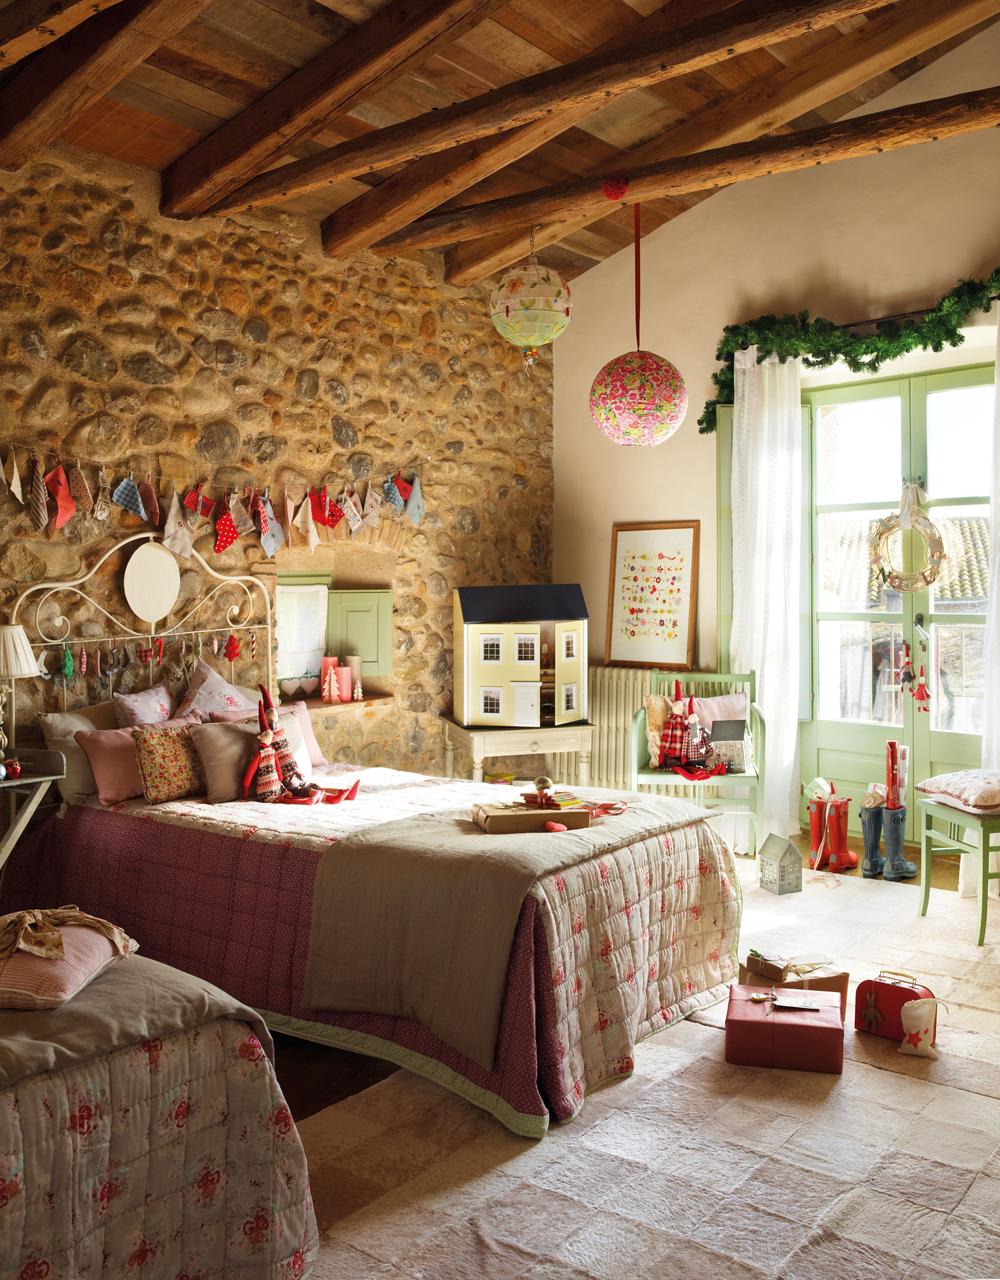 Adornos de navidad para decorar la habitaci n infantil for Casa moderna jardin d el menzah